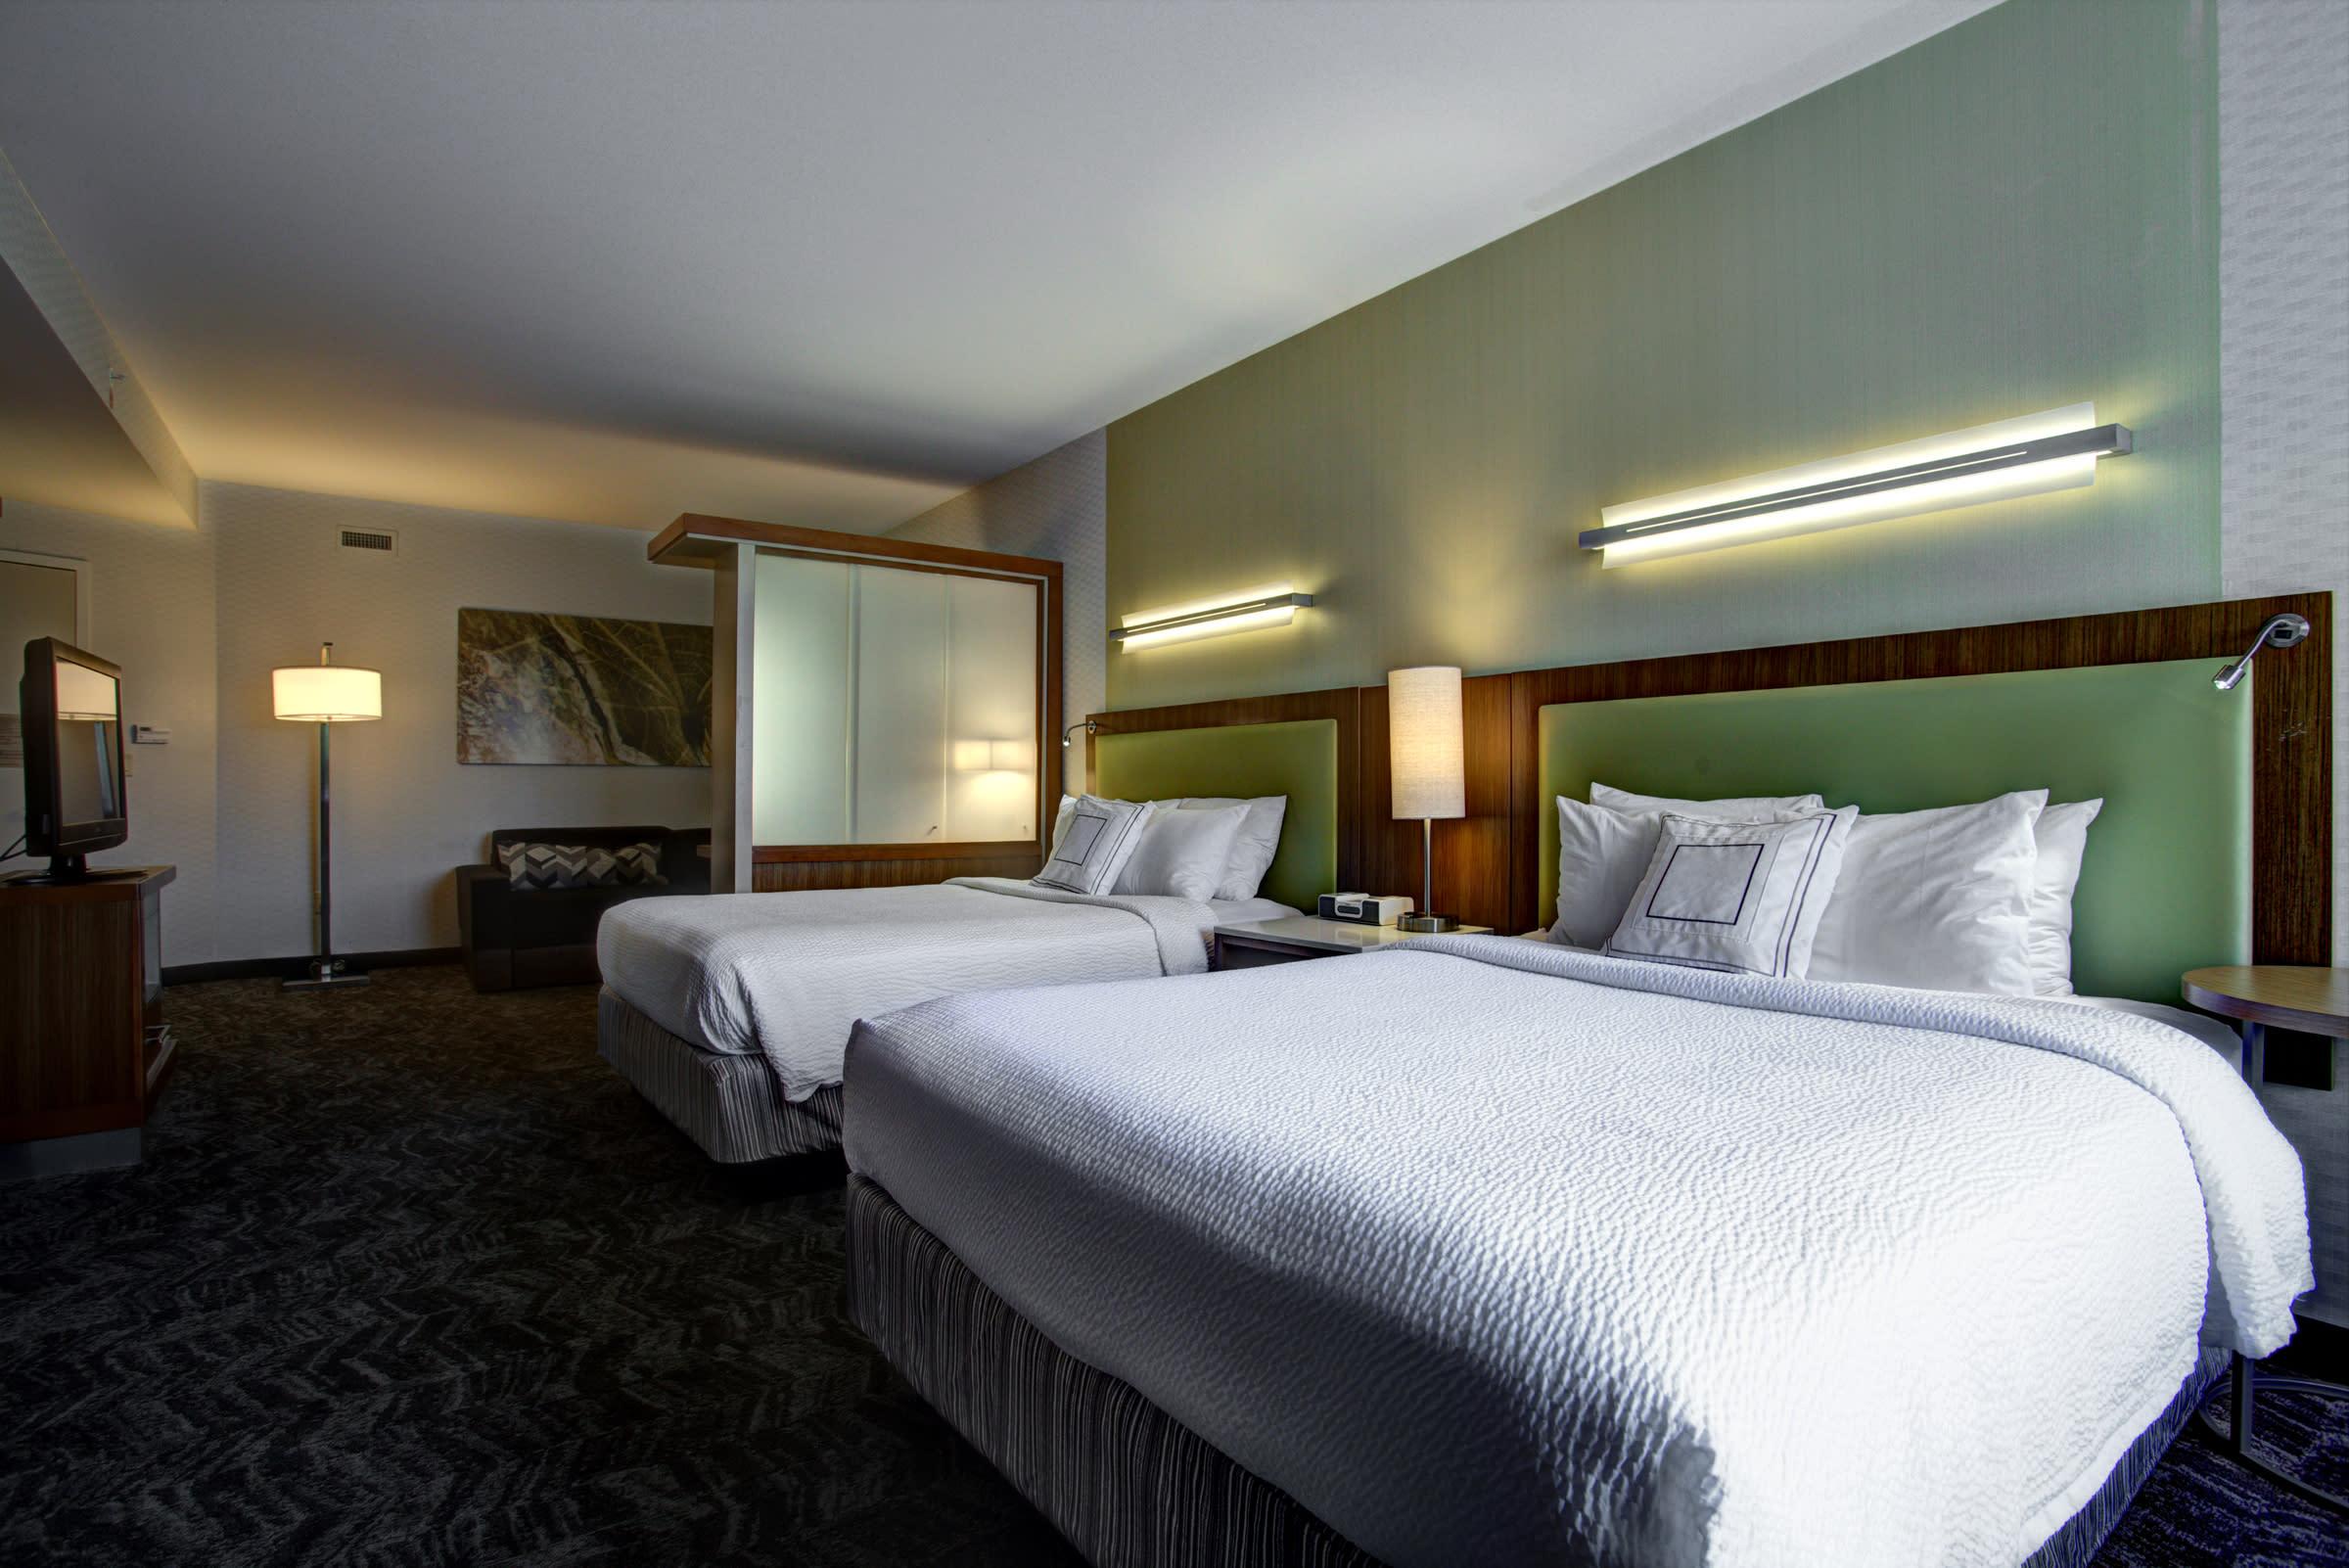 2 Bedroom Suites Near Hershey Park - Bedroom Ideas